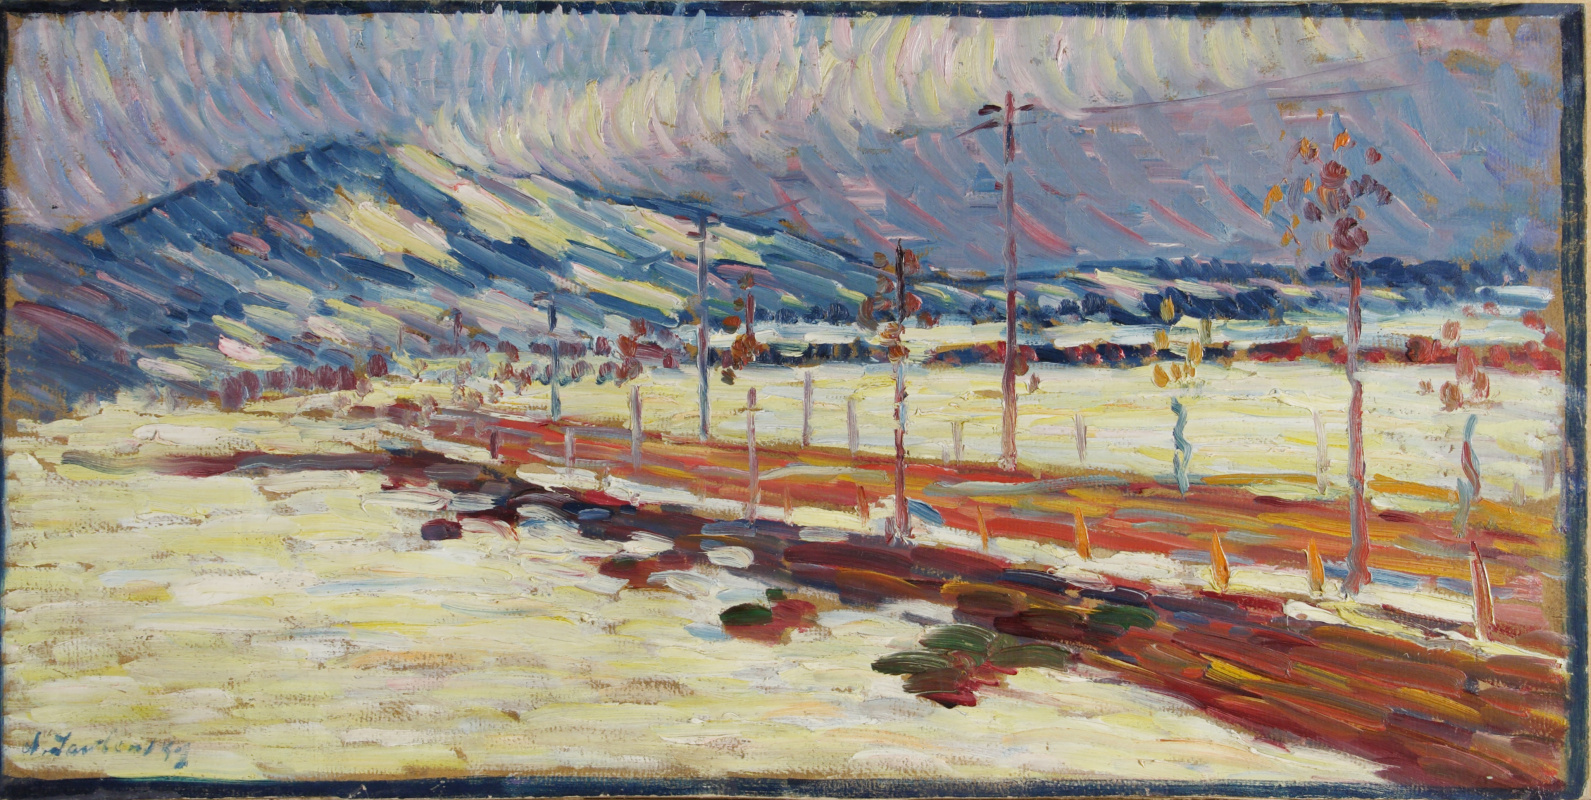 Alexej von Jawlensky. Road